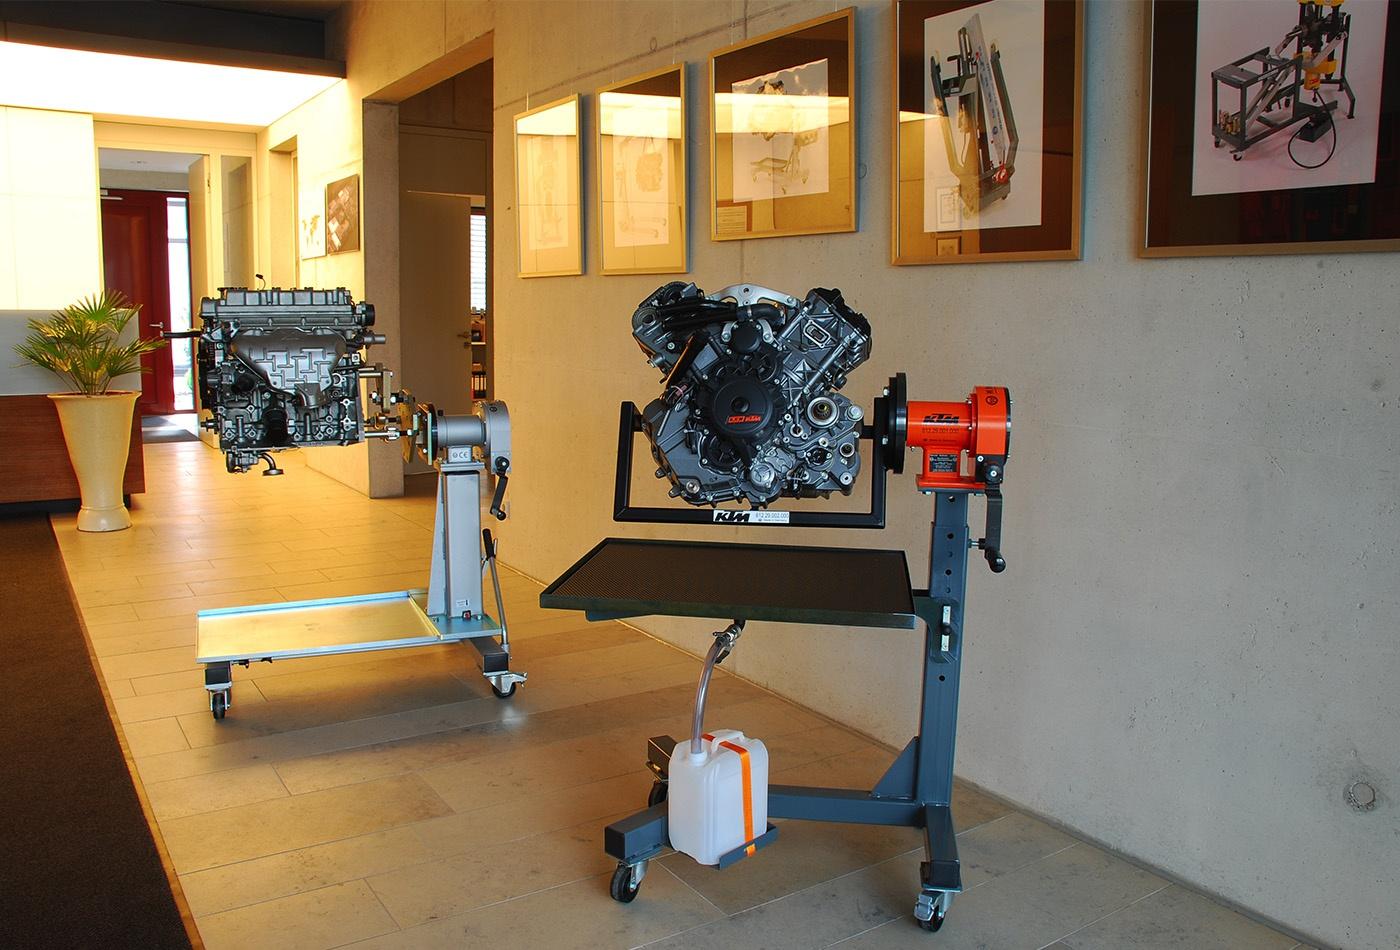 Weitner Motorsiklet Mopet Motor Toplama Tezgahı [150 Kg]